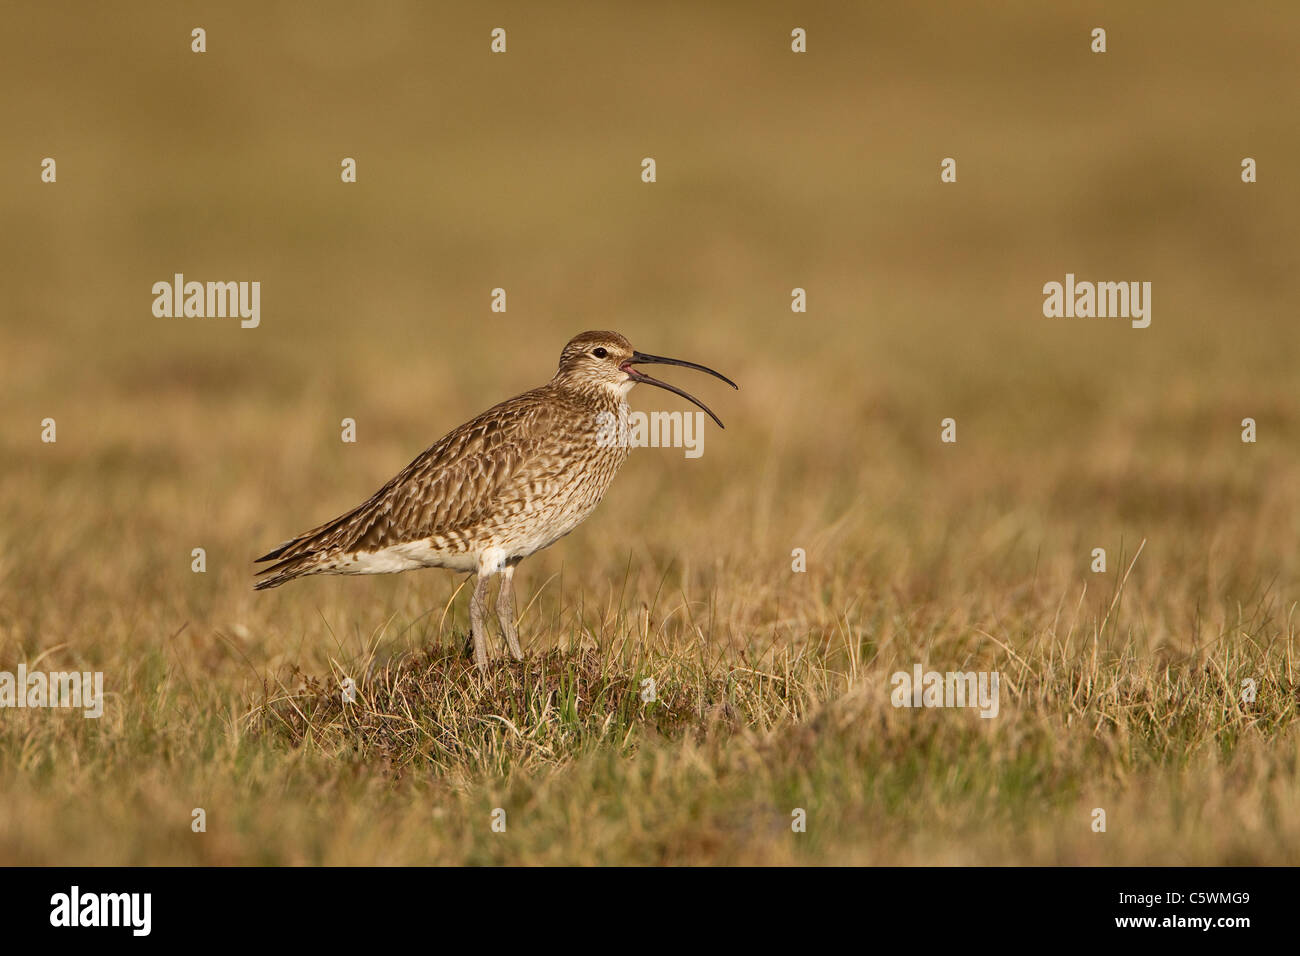 Whimbrel (Numenius phaeopus), adult calling on breeding grounds, Shetland, Scotland, Great Britain. - Stock Image